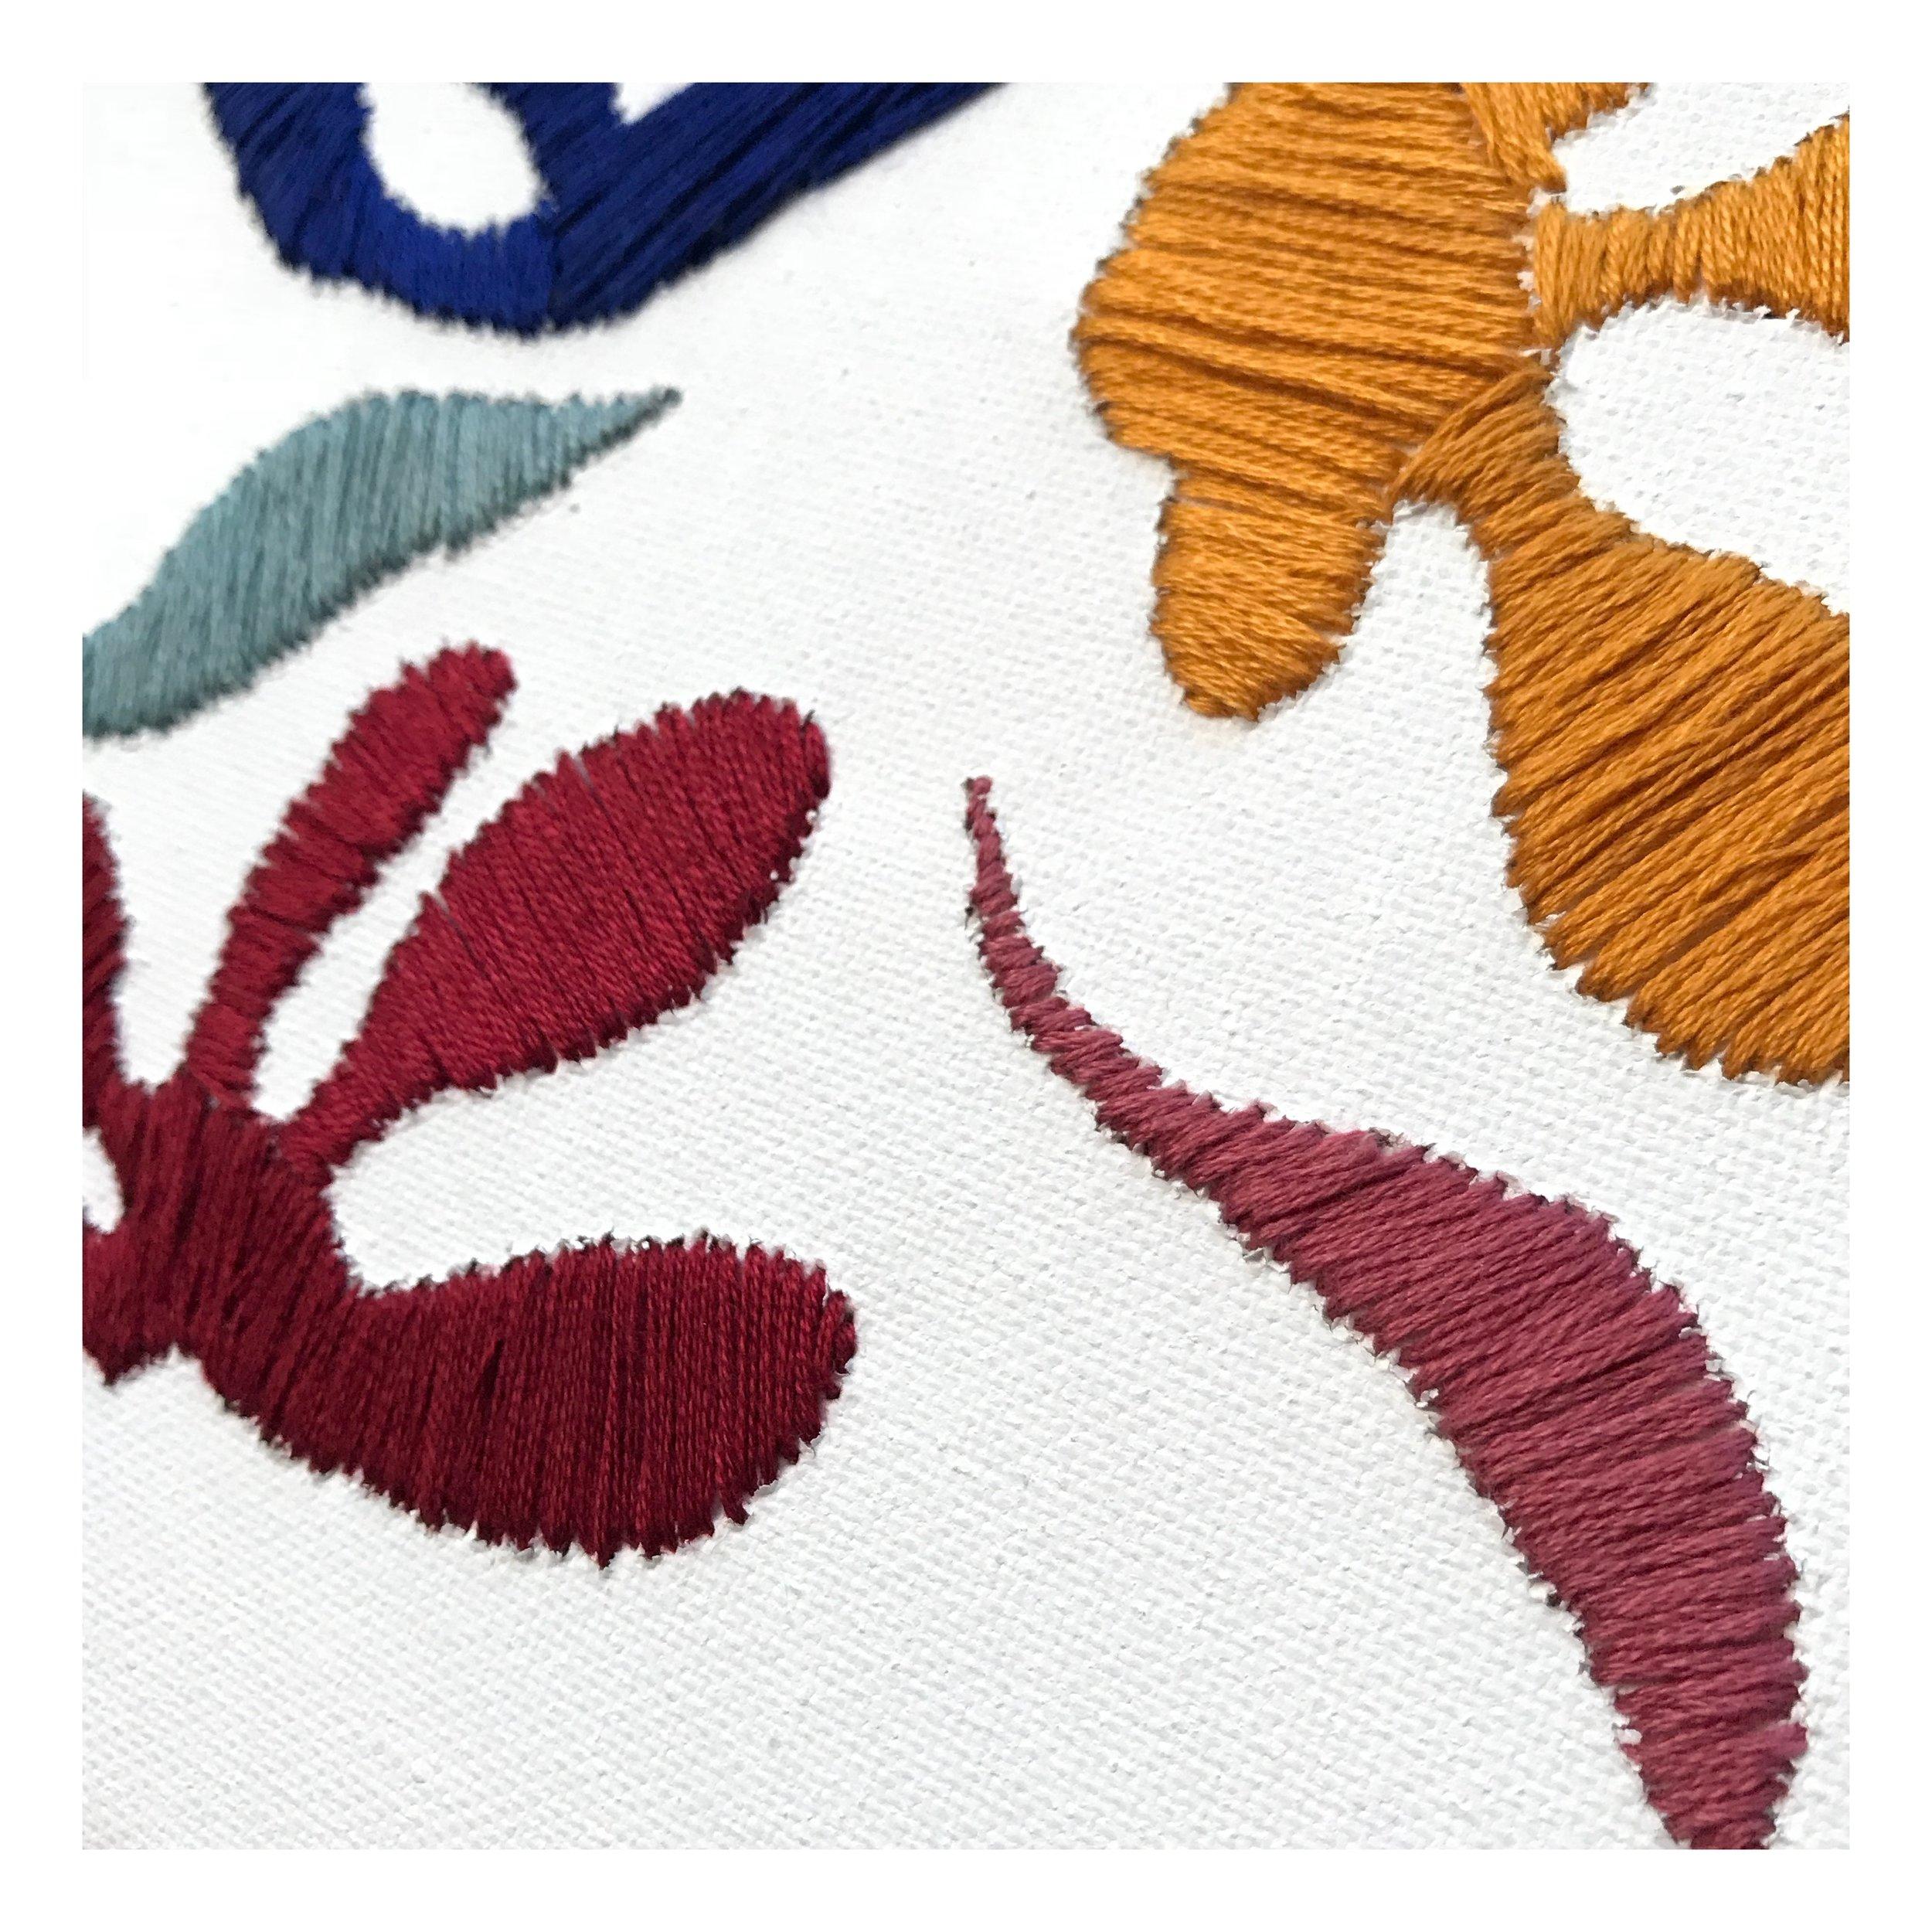 Detail of work | series IV